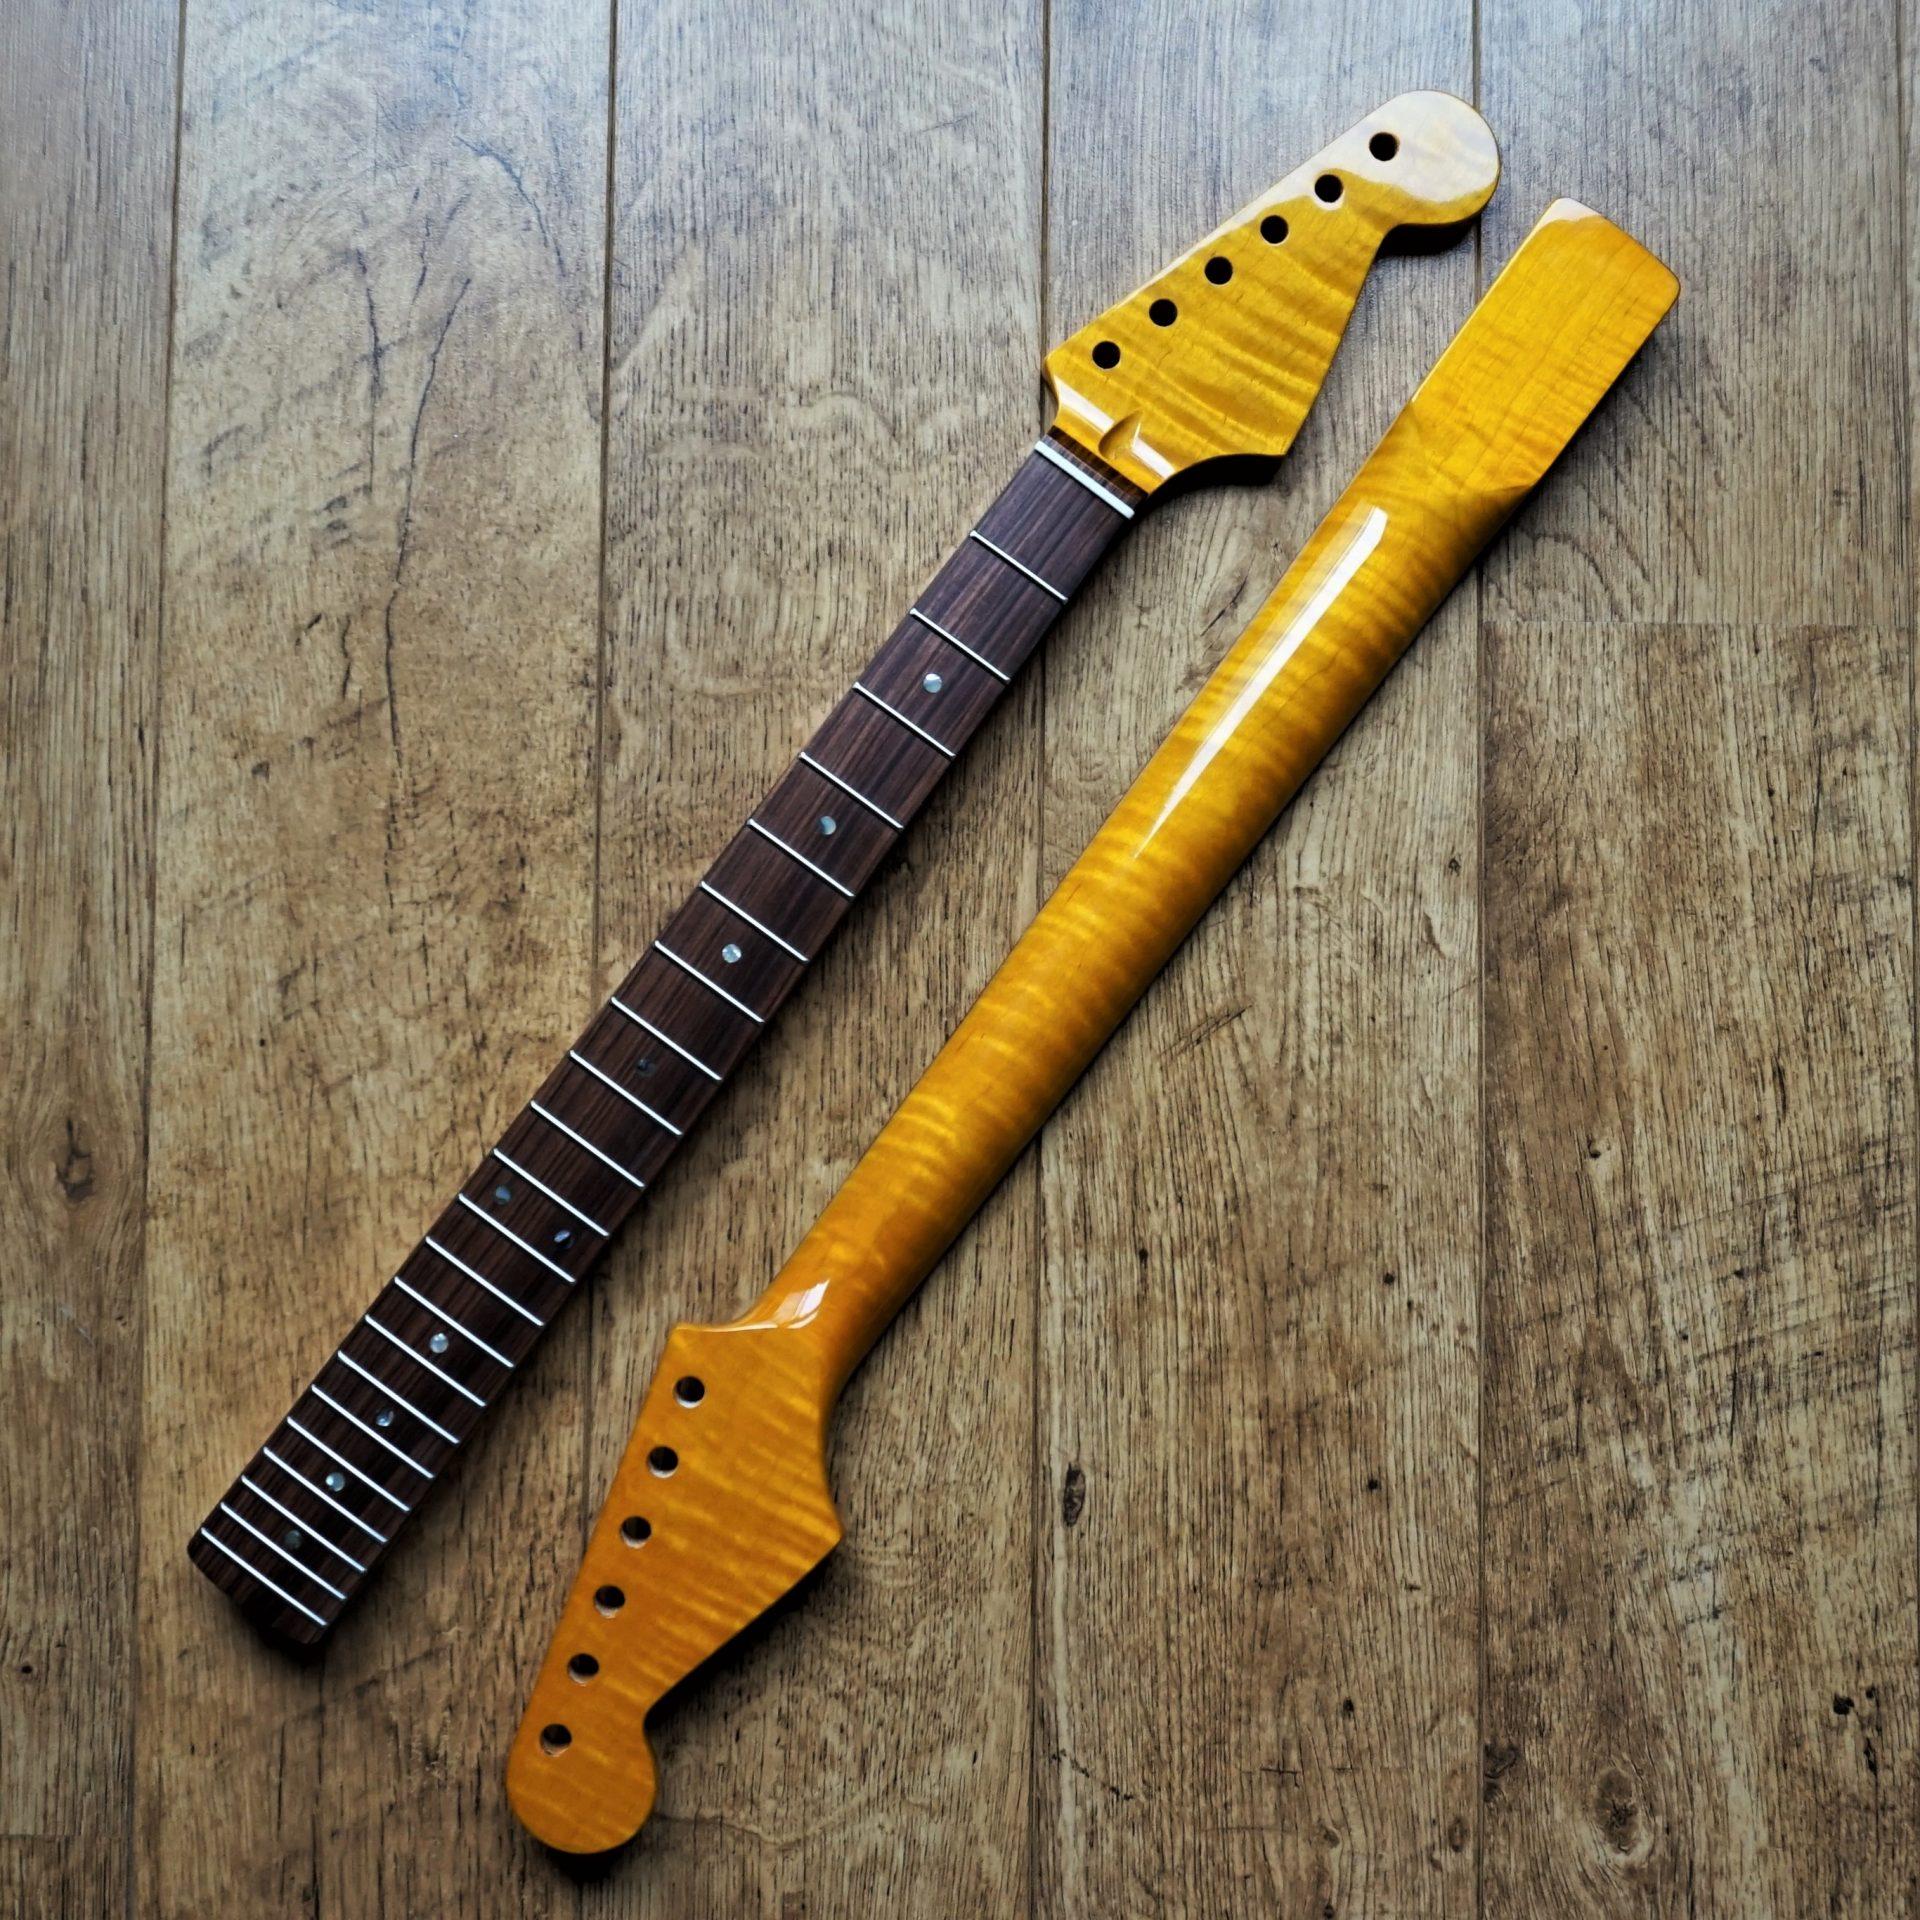 stratocaster kabukalli and flame maple guitar neck abalone guitar anatomy. Black Bedroom Furniture Sets. Home Design Ideas